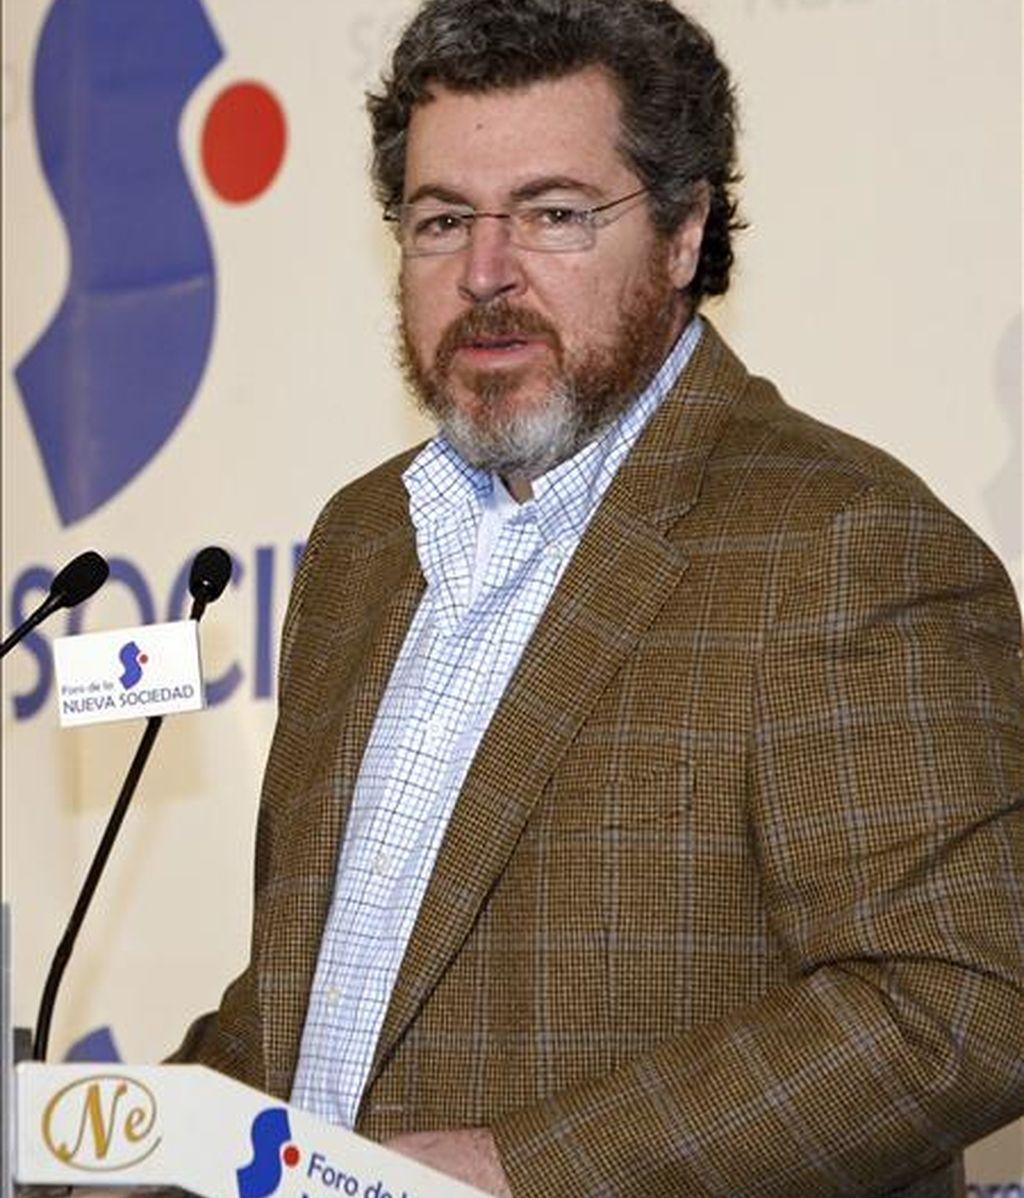 El director ejecutivo de Greenpeace, Juan López de Uralde. EFE/Archivo